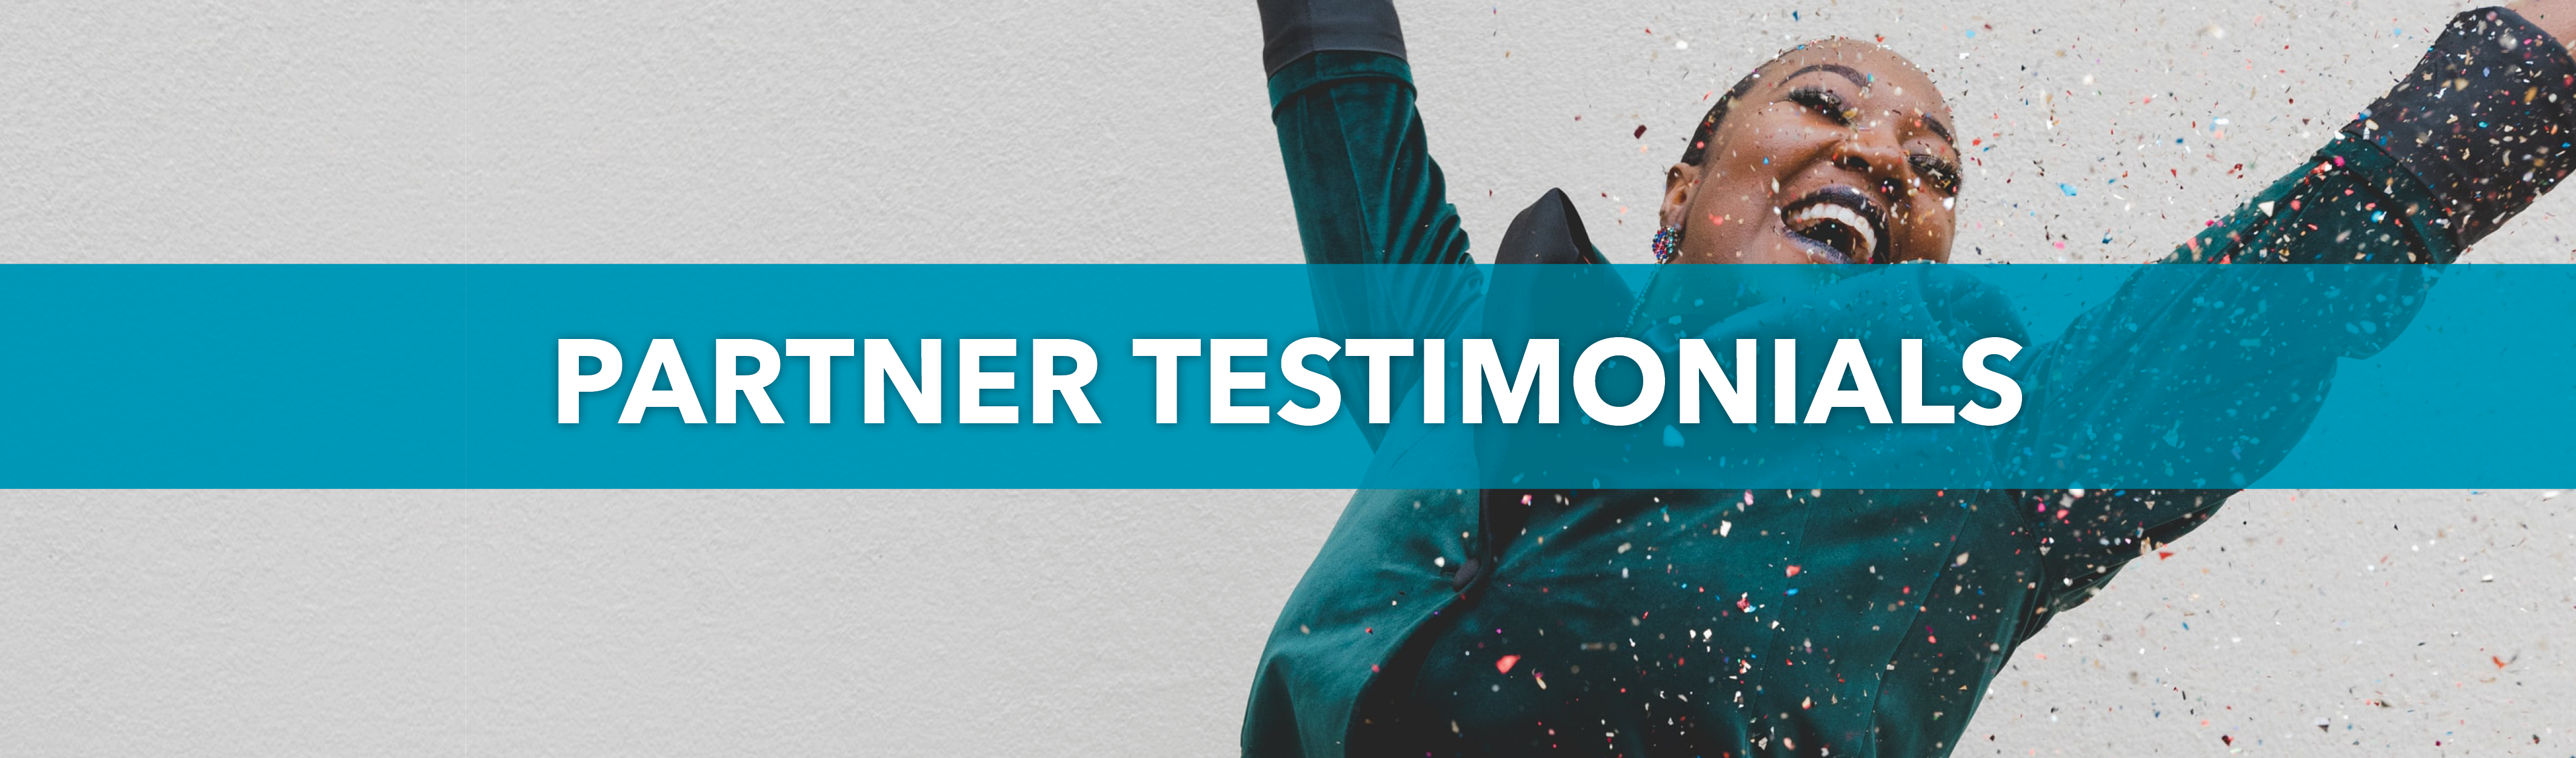 Testimonials - Web Header 040121